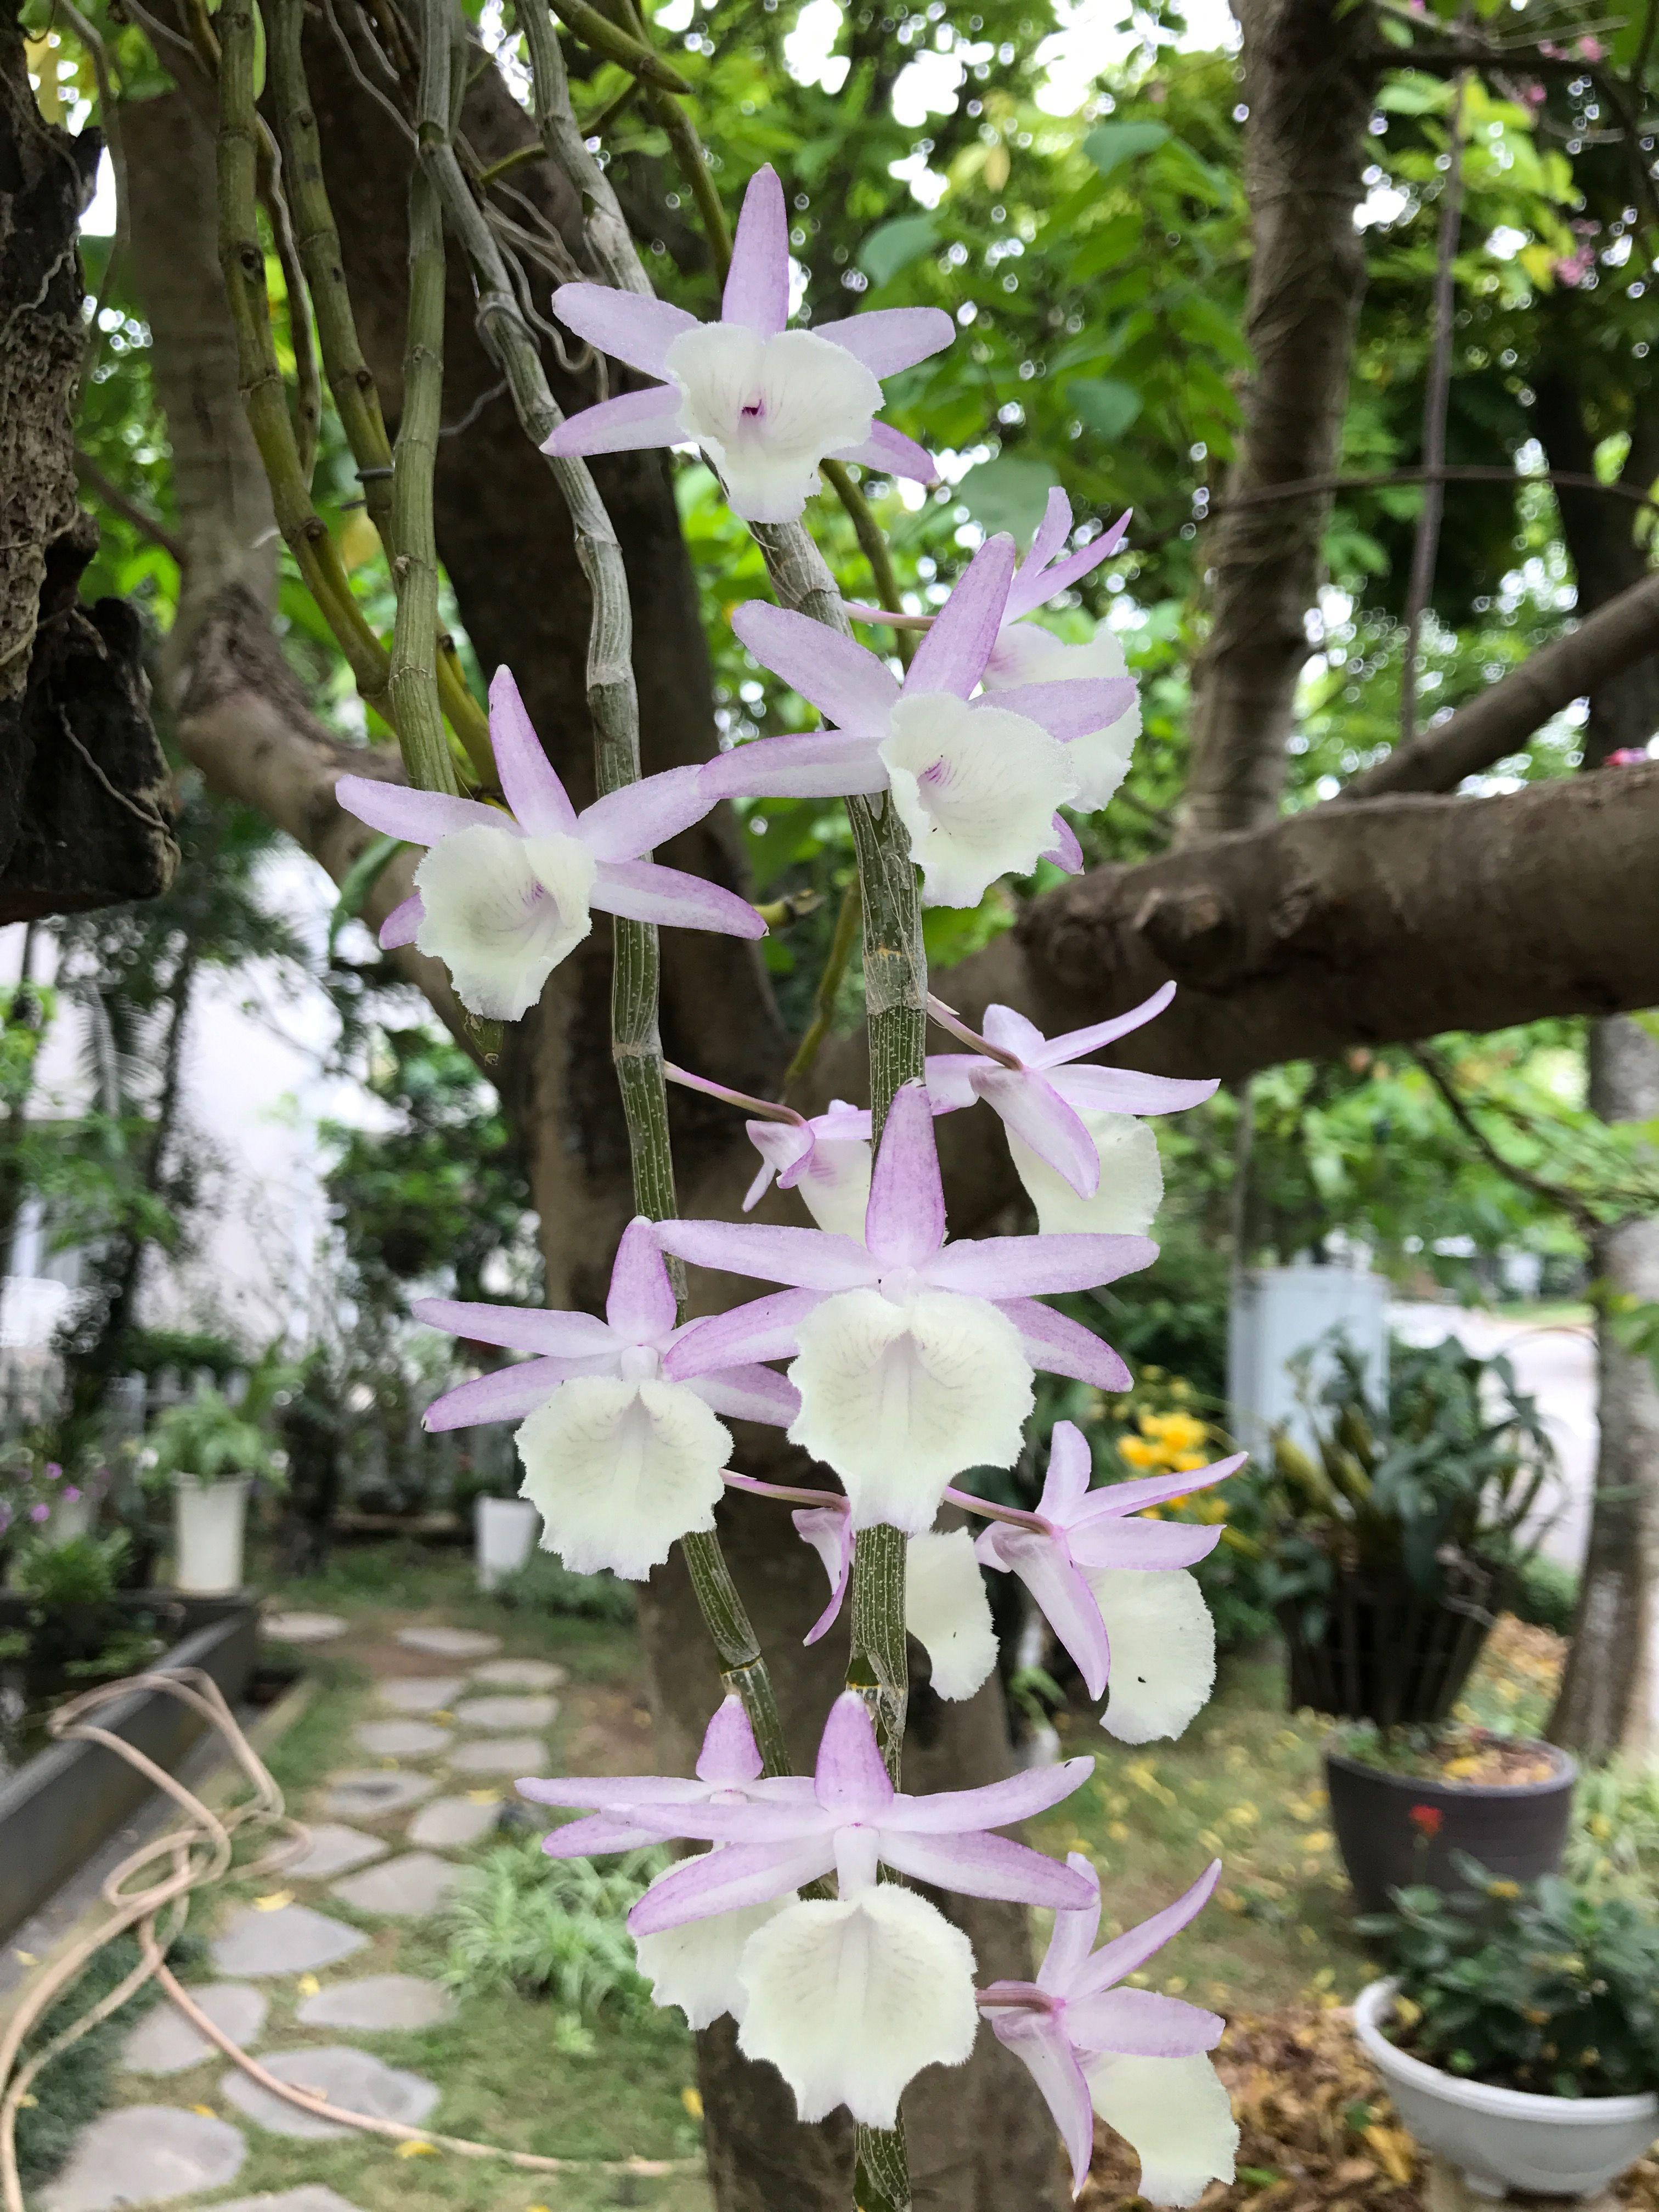 Pin by annguyen on orchid garden ideas pinterest orchids garden